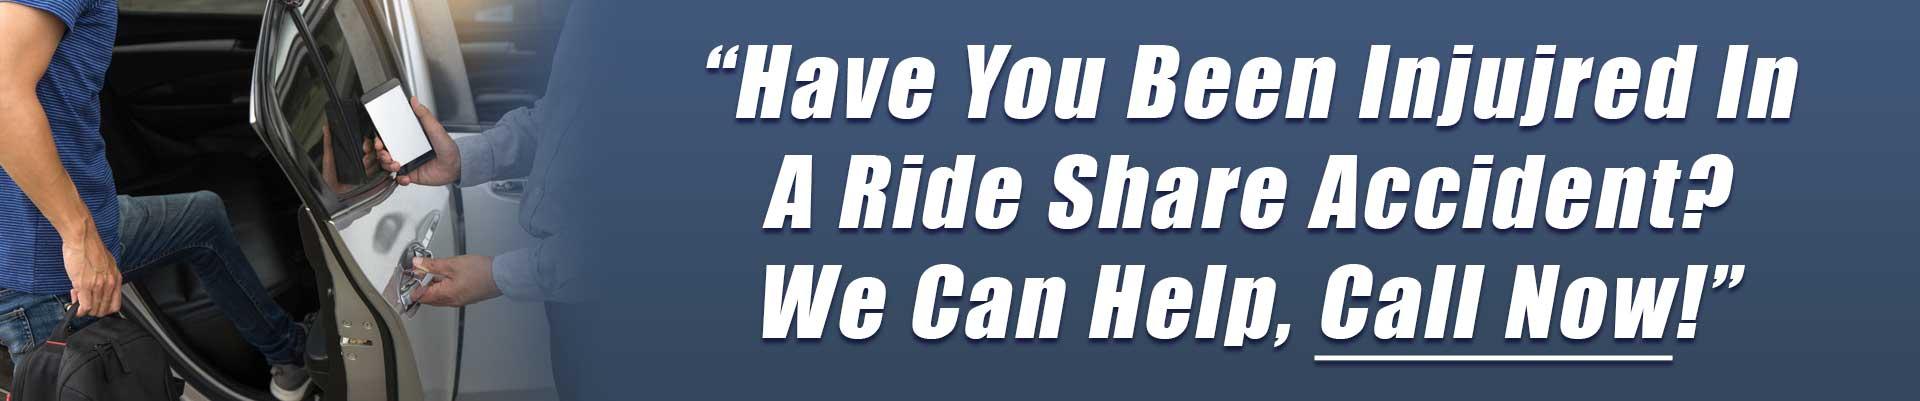 Phoenix Rideshare (Uber / Lyft) Accident Lawyer